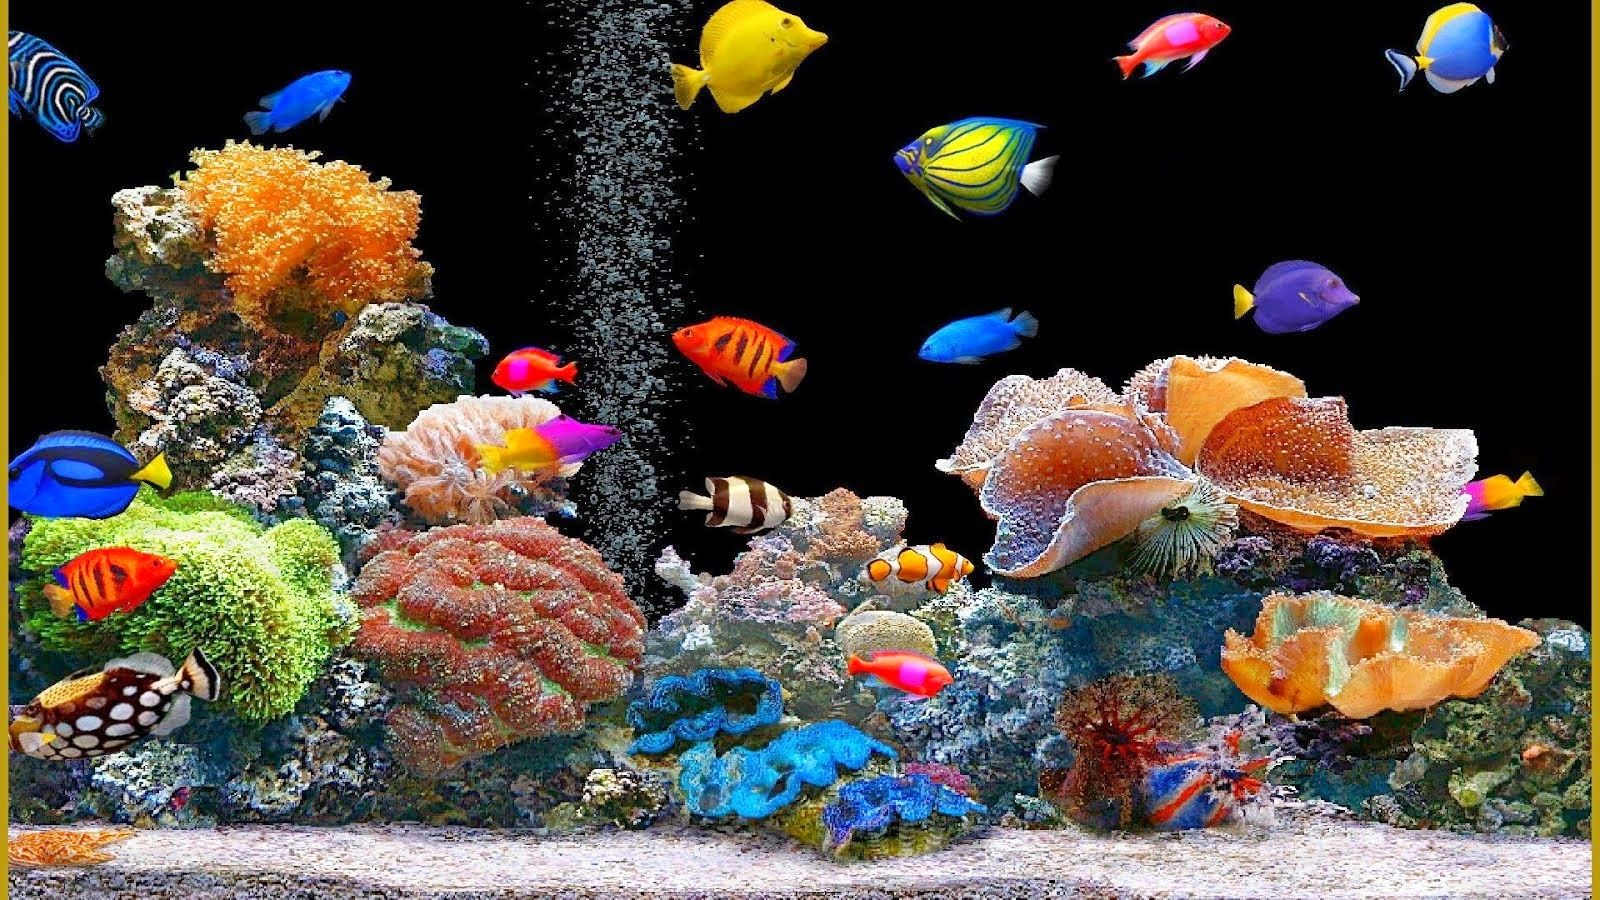 animated fish tank aquarium download animated fish tank wallpaper